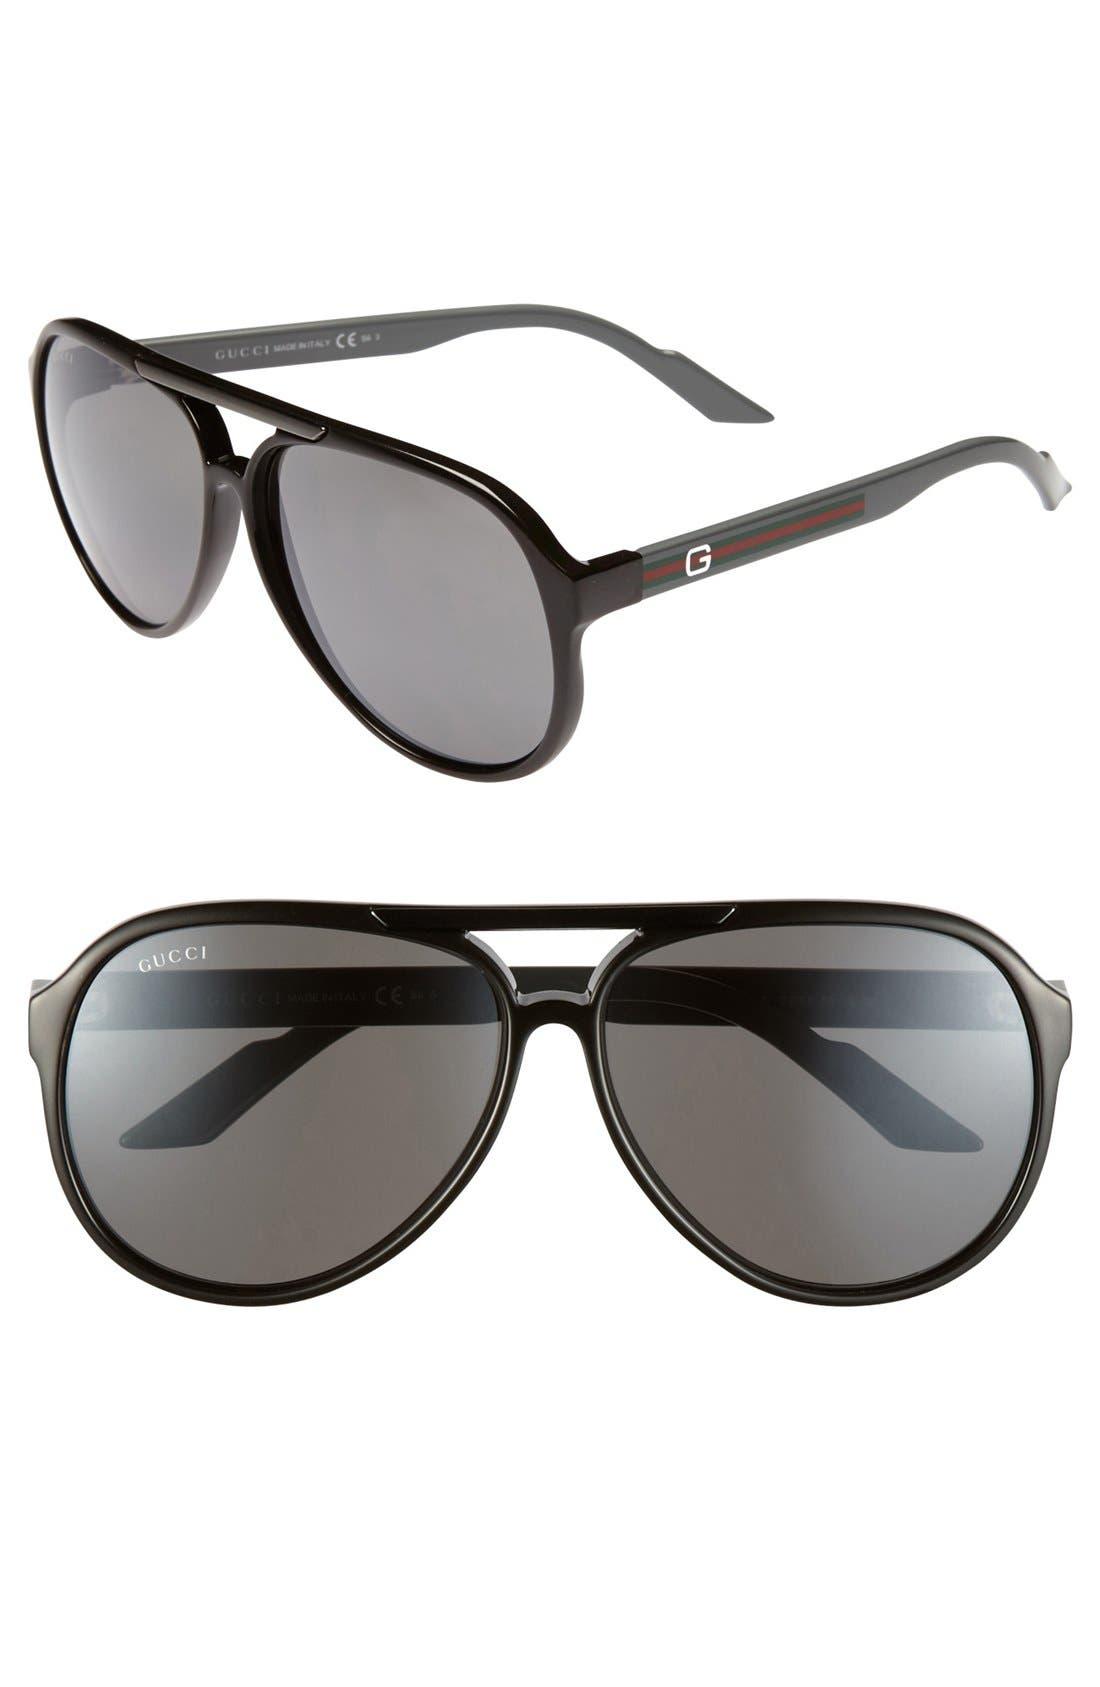 Alternate Image 1 Selected - Gucci '1627/S' 59mm Aviator Sunglasses